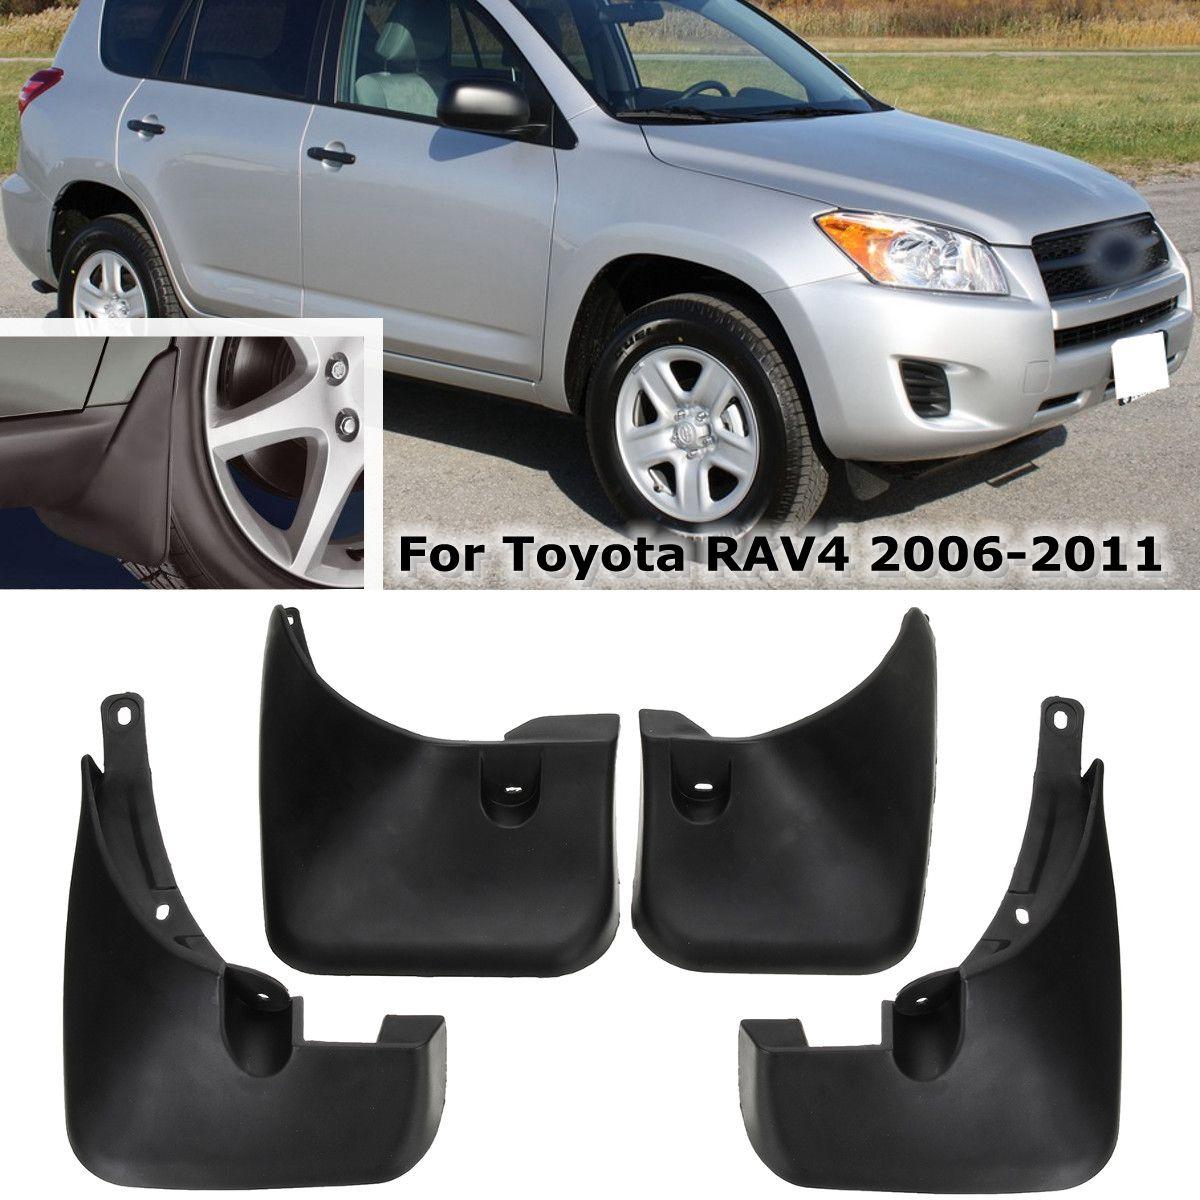 Coche salvabarros, guardias guardabarros accesorios de guardabarros para Toyota RAV4 2006, 2007, 2008, 2009, 2010, 2011, 2012